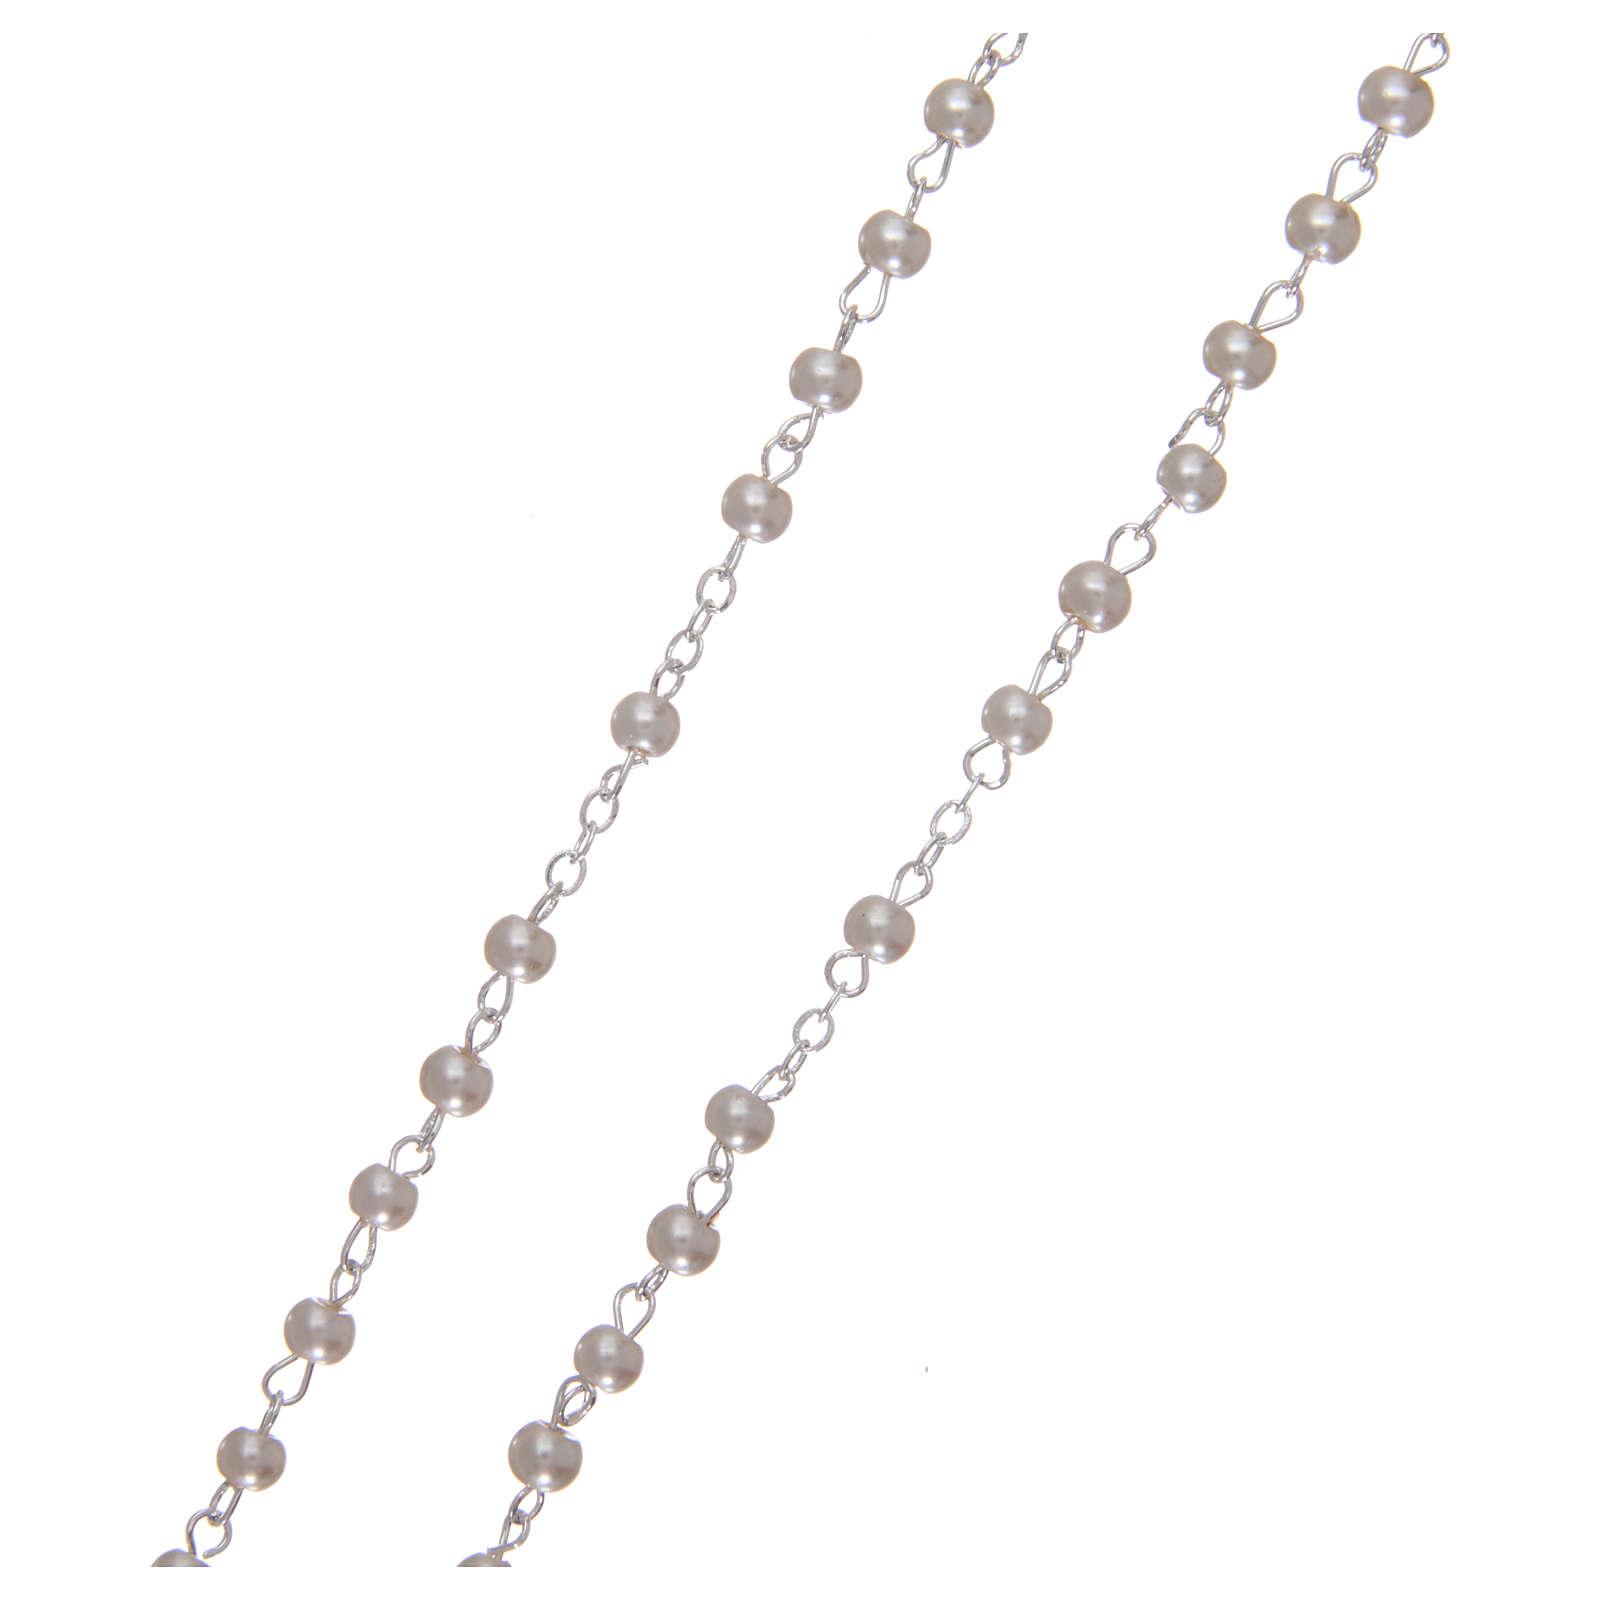 Rosario símil perla 2 mm blanco 4